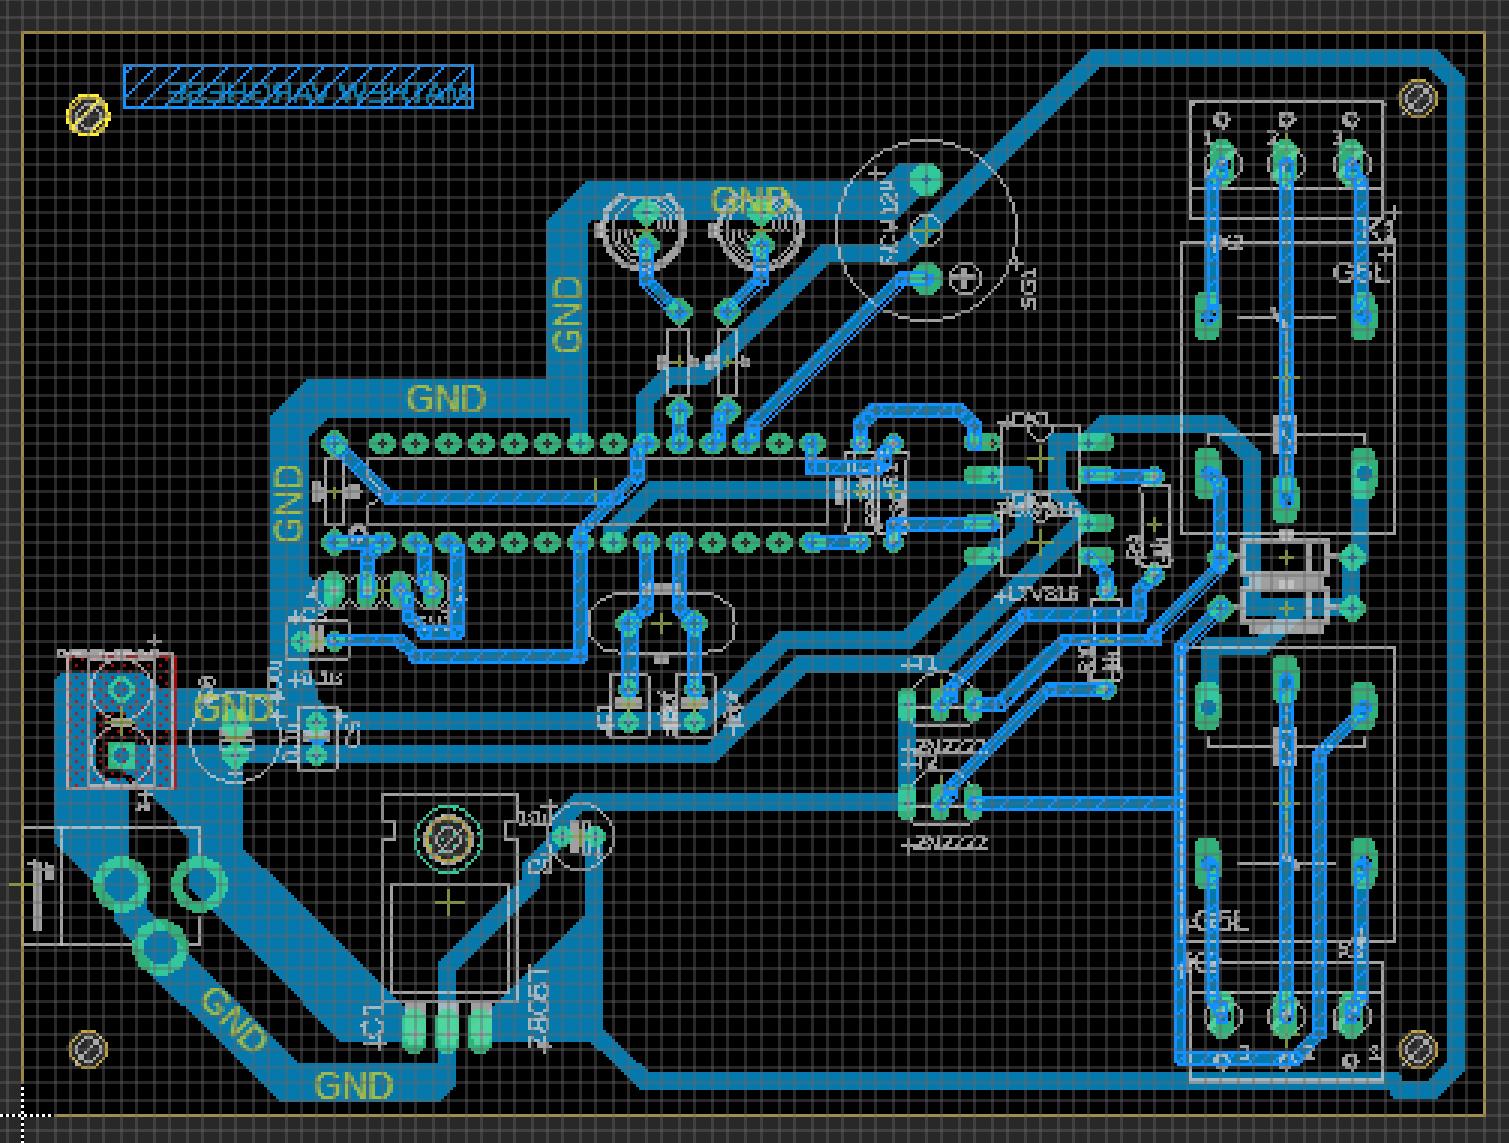 GSM motor controller